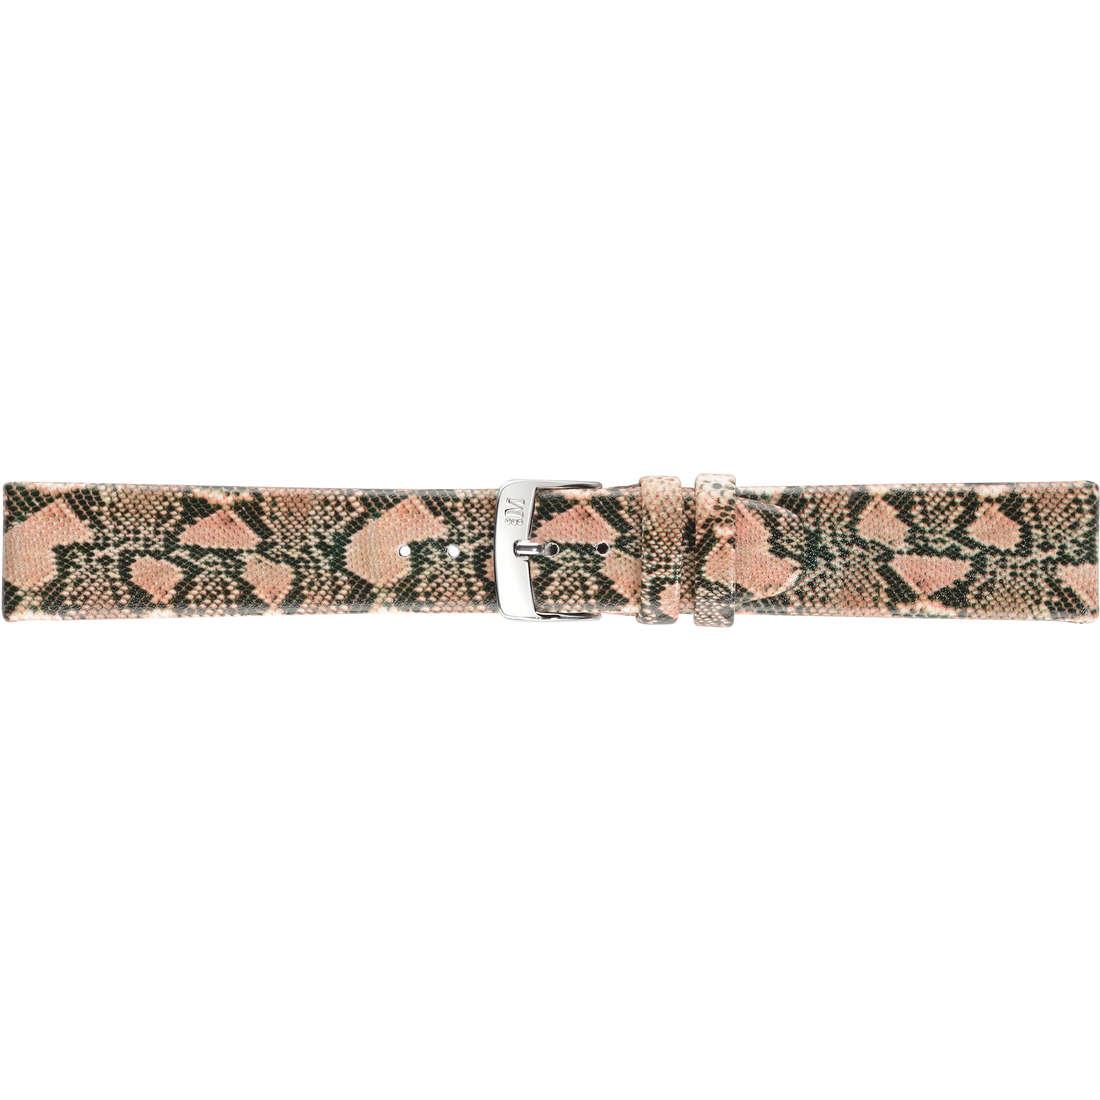 watch watch bands watch straps woman Morellato Morellato 1930 A01D3642934803CR18